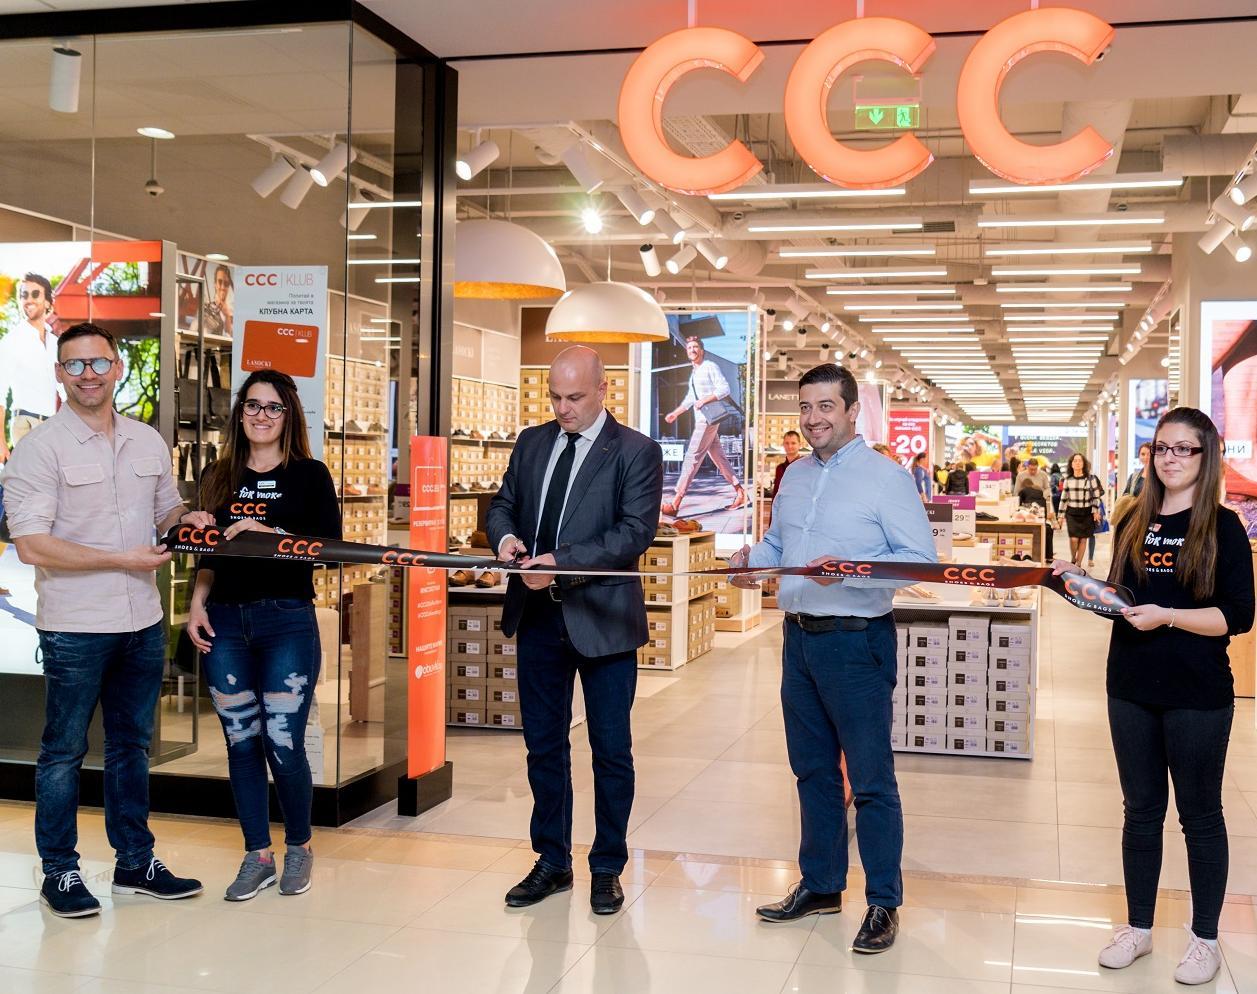 CCC opened a shop at Mall Veliko Tarnovo